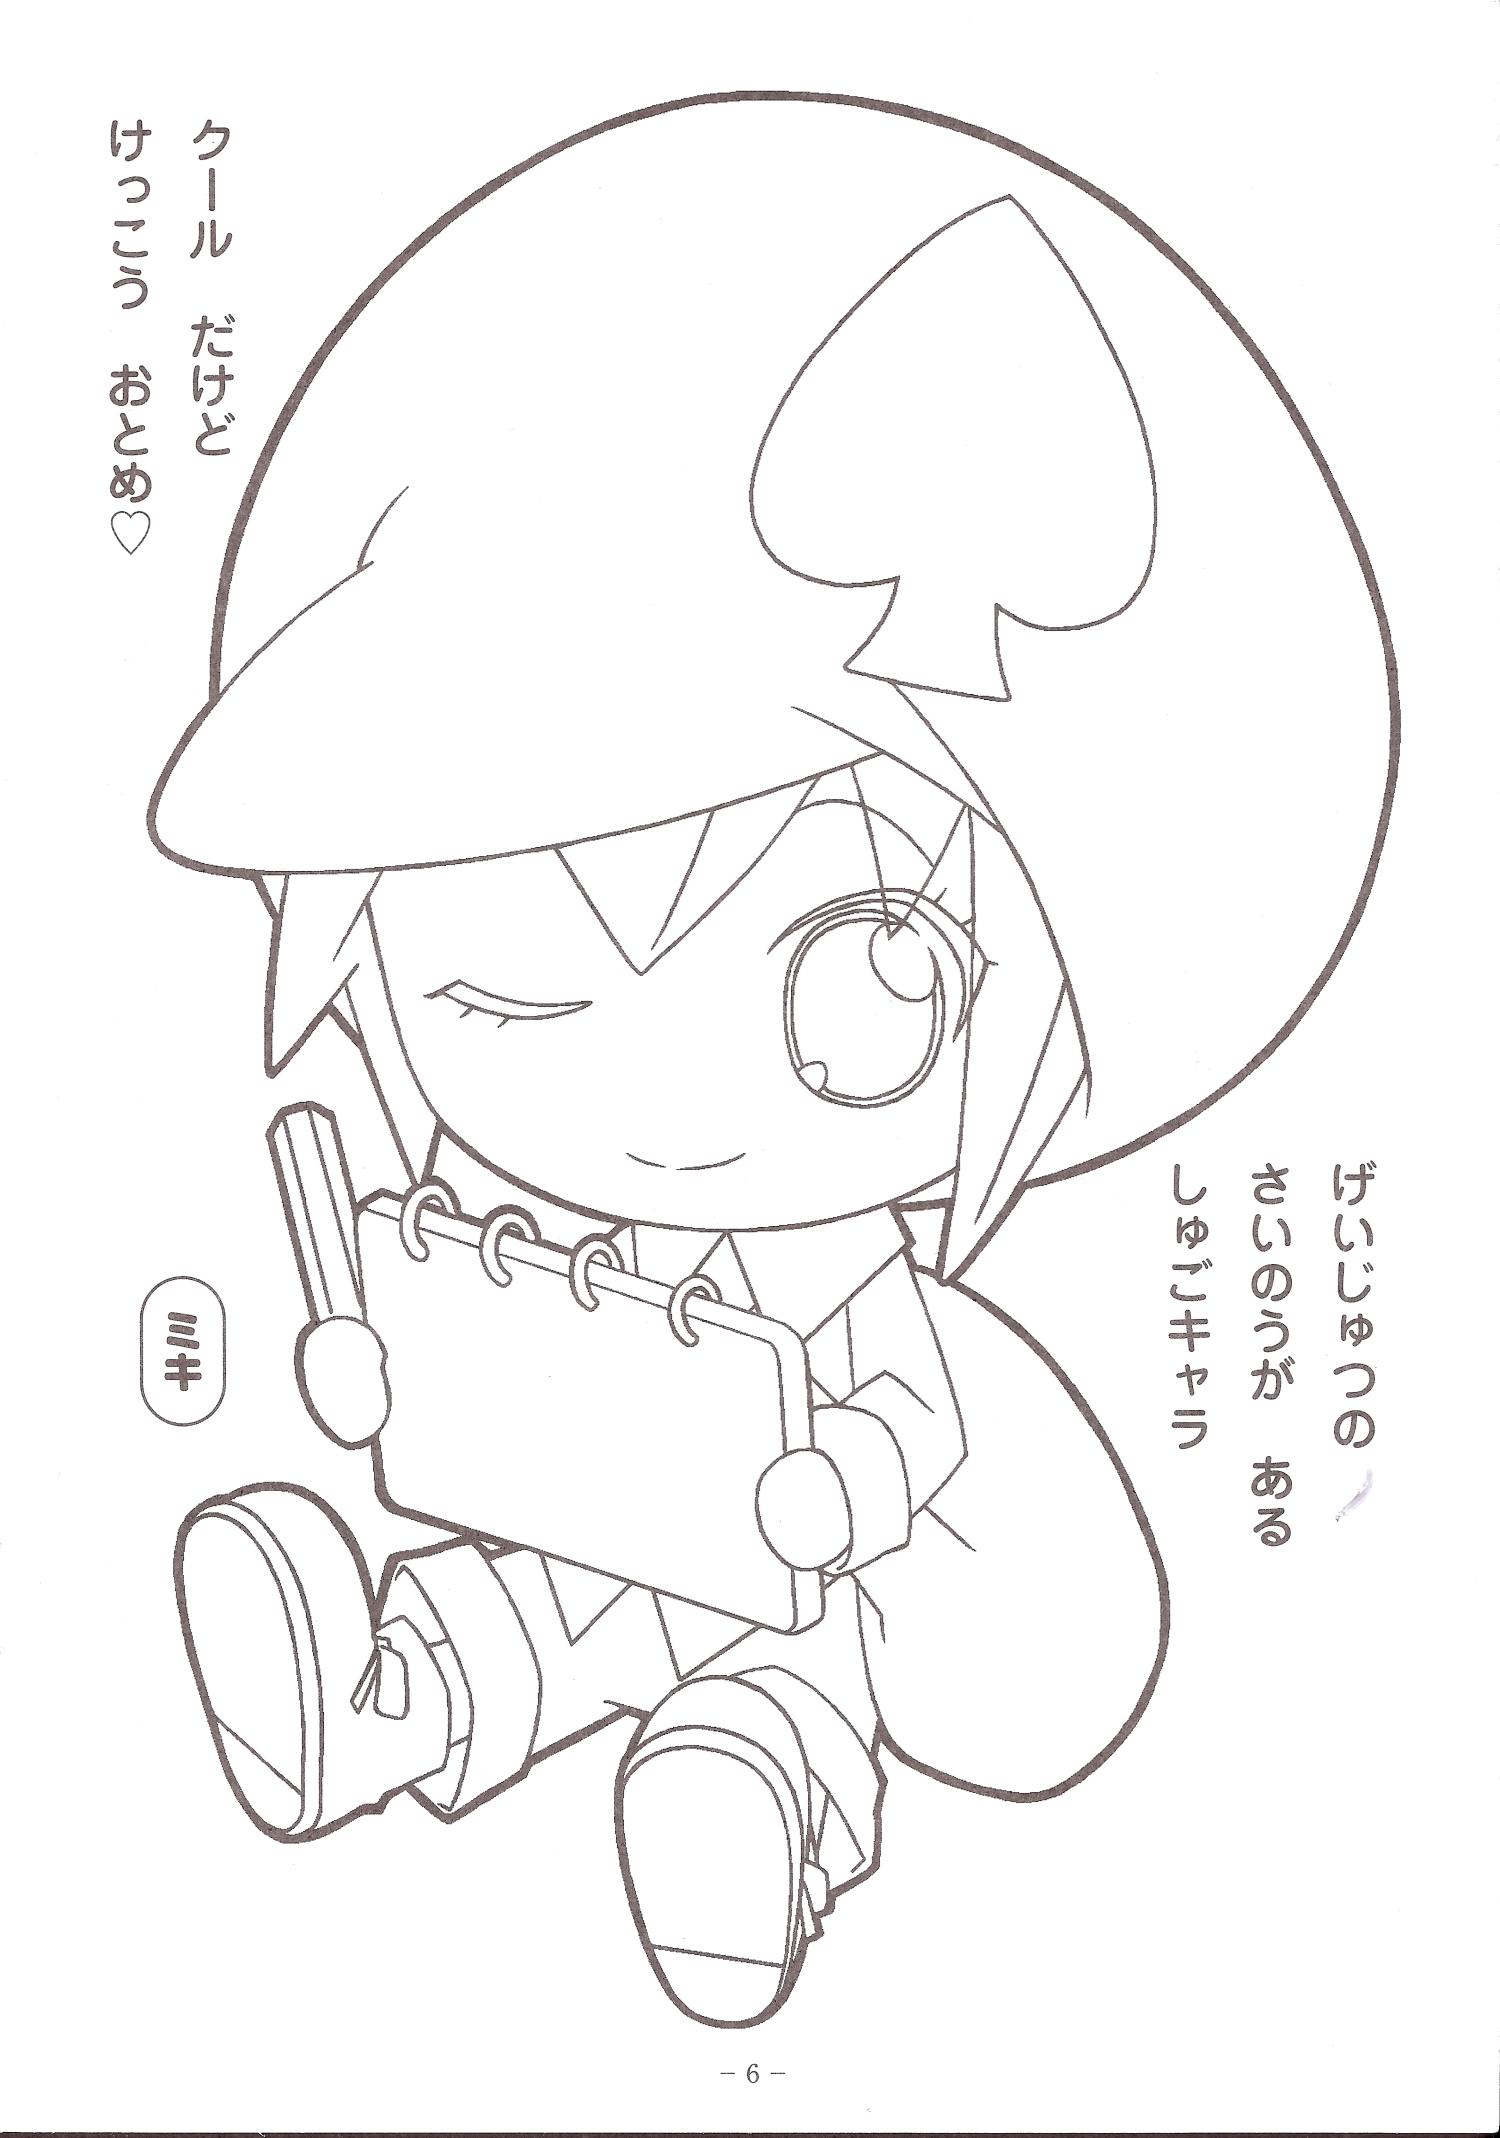 shugo chara coloring pages - photo#24